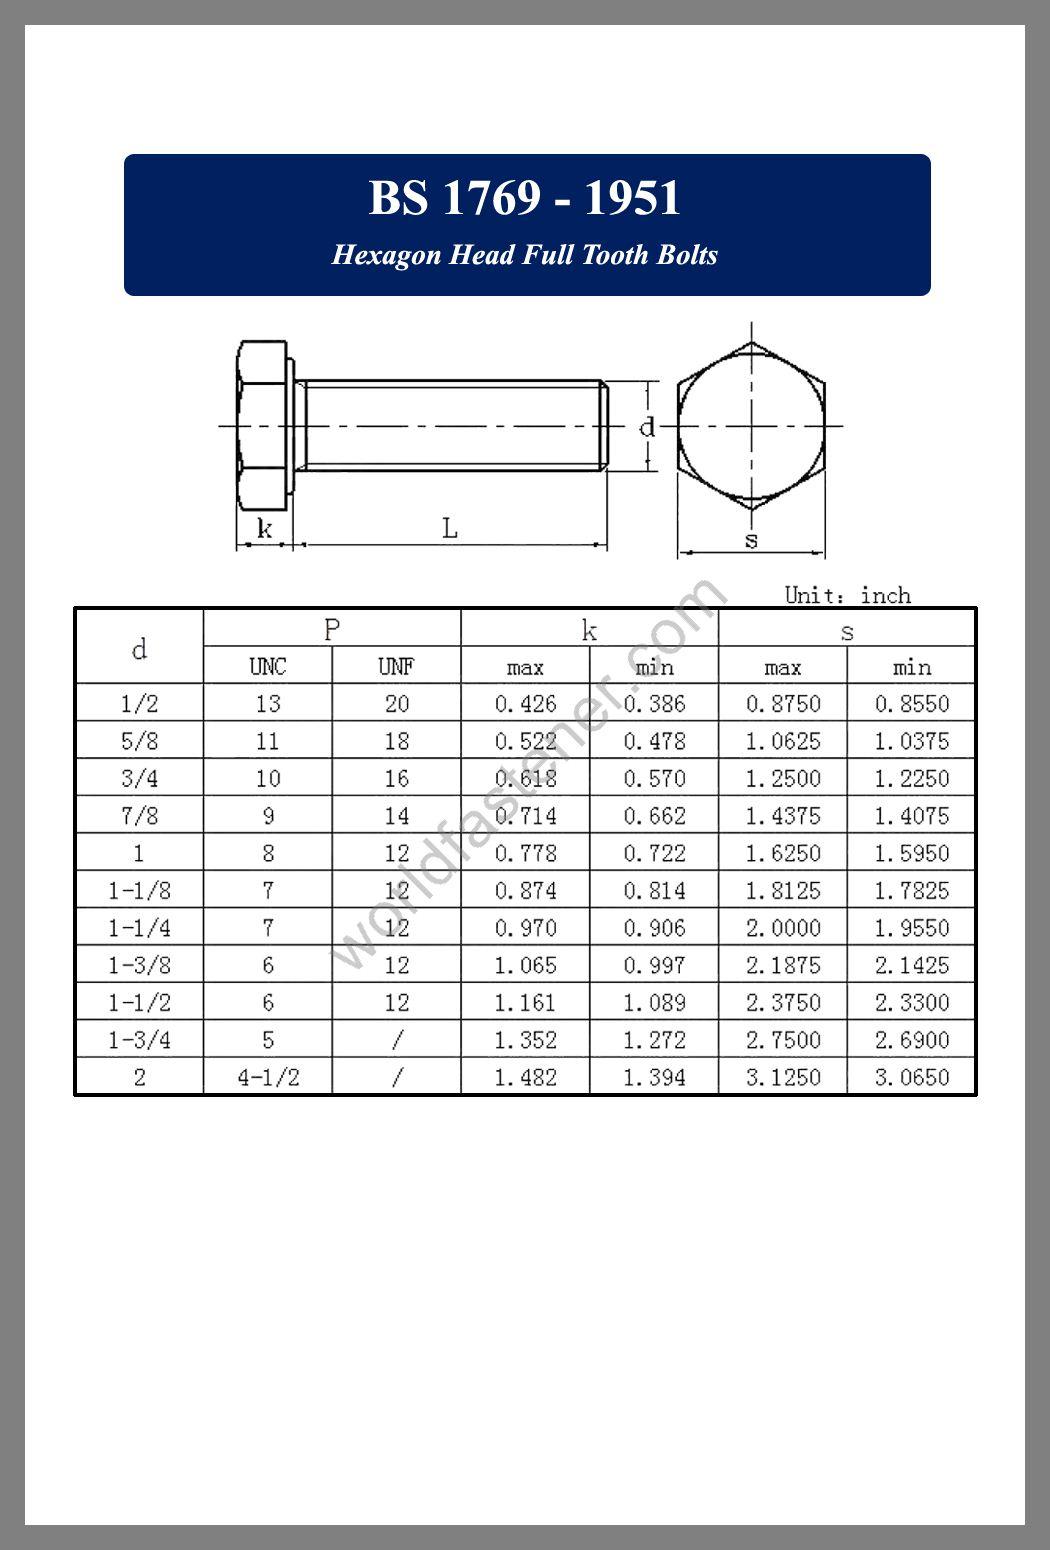 BS 1769, BS 1769 Hexagon Head Full Tooth Bolts, fastener, screw, bolt, BS Bolt, BS fastener